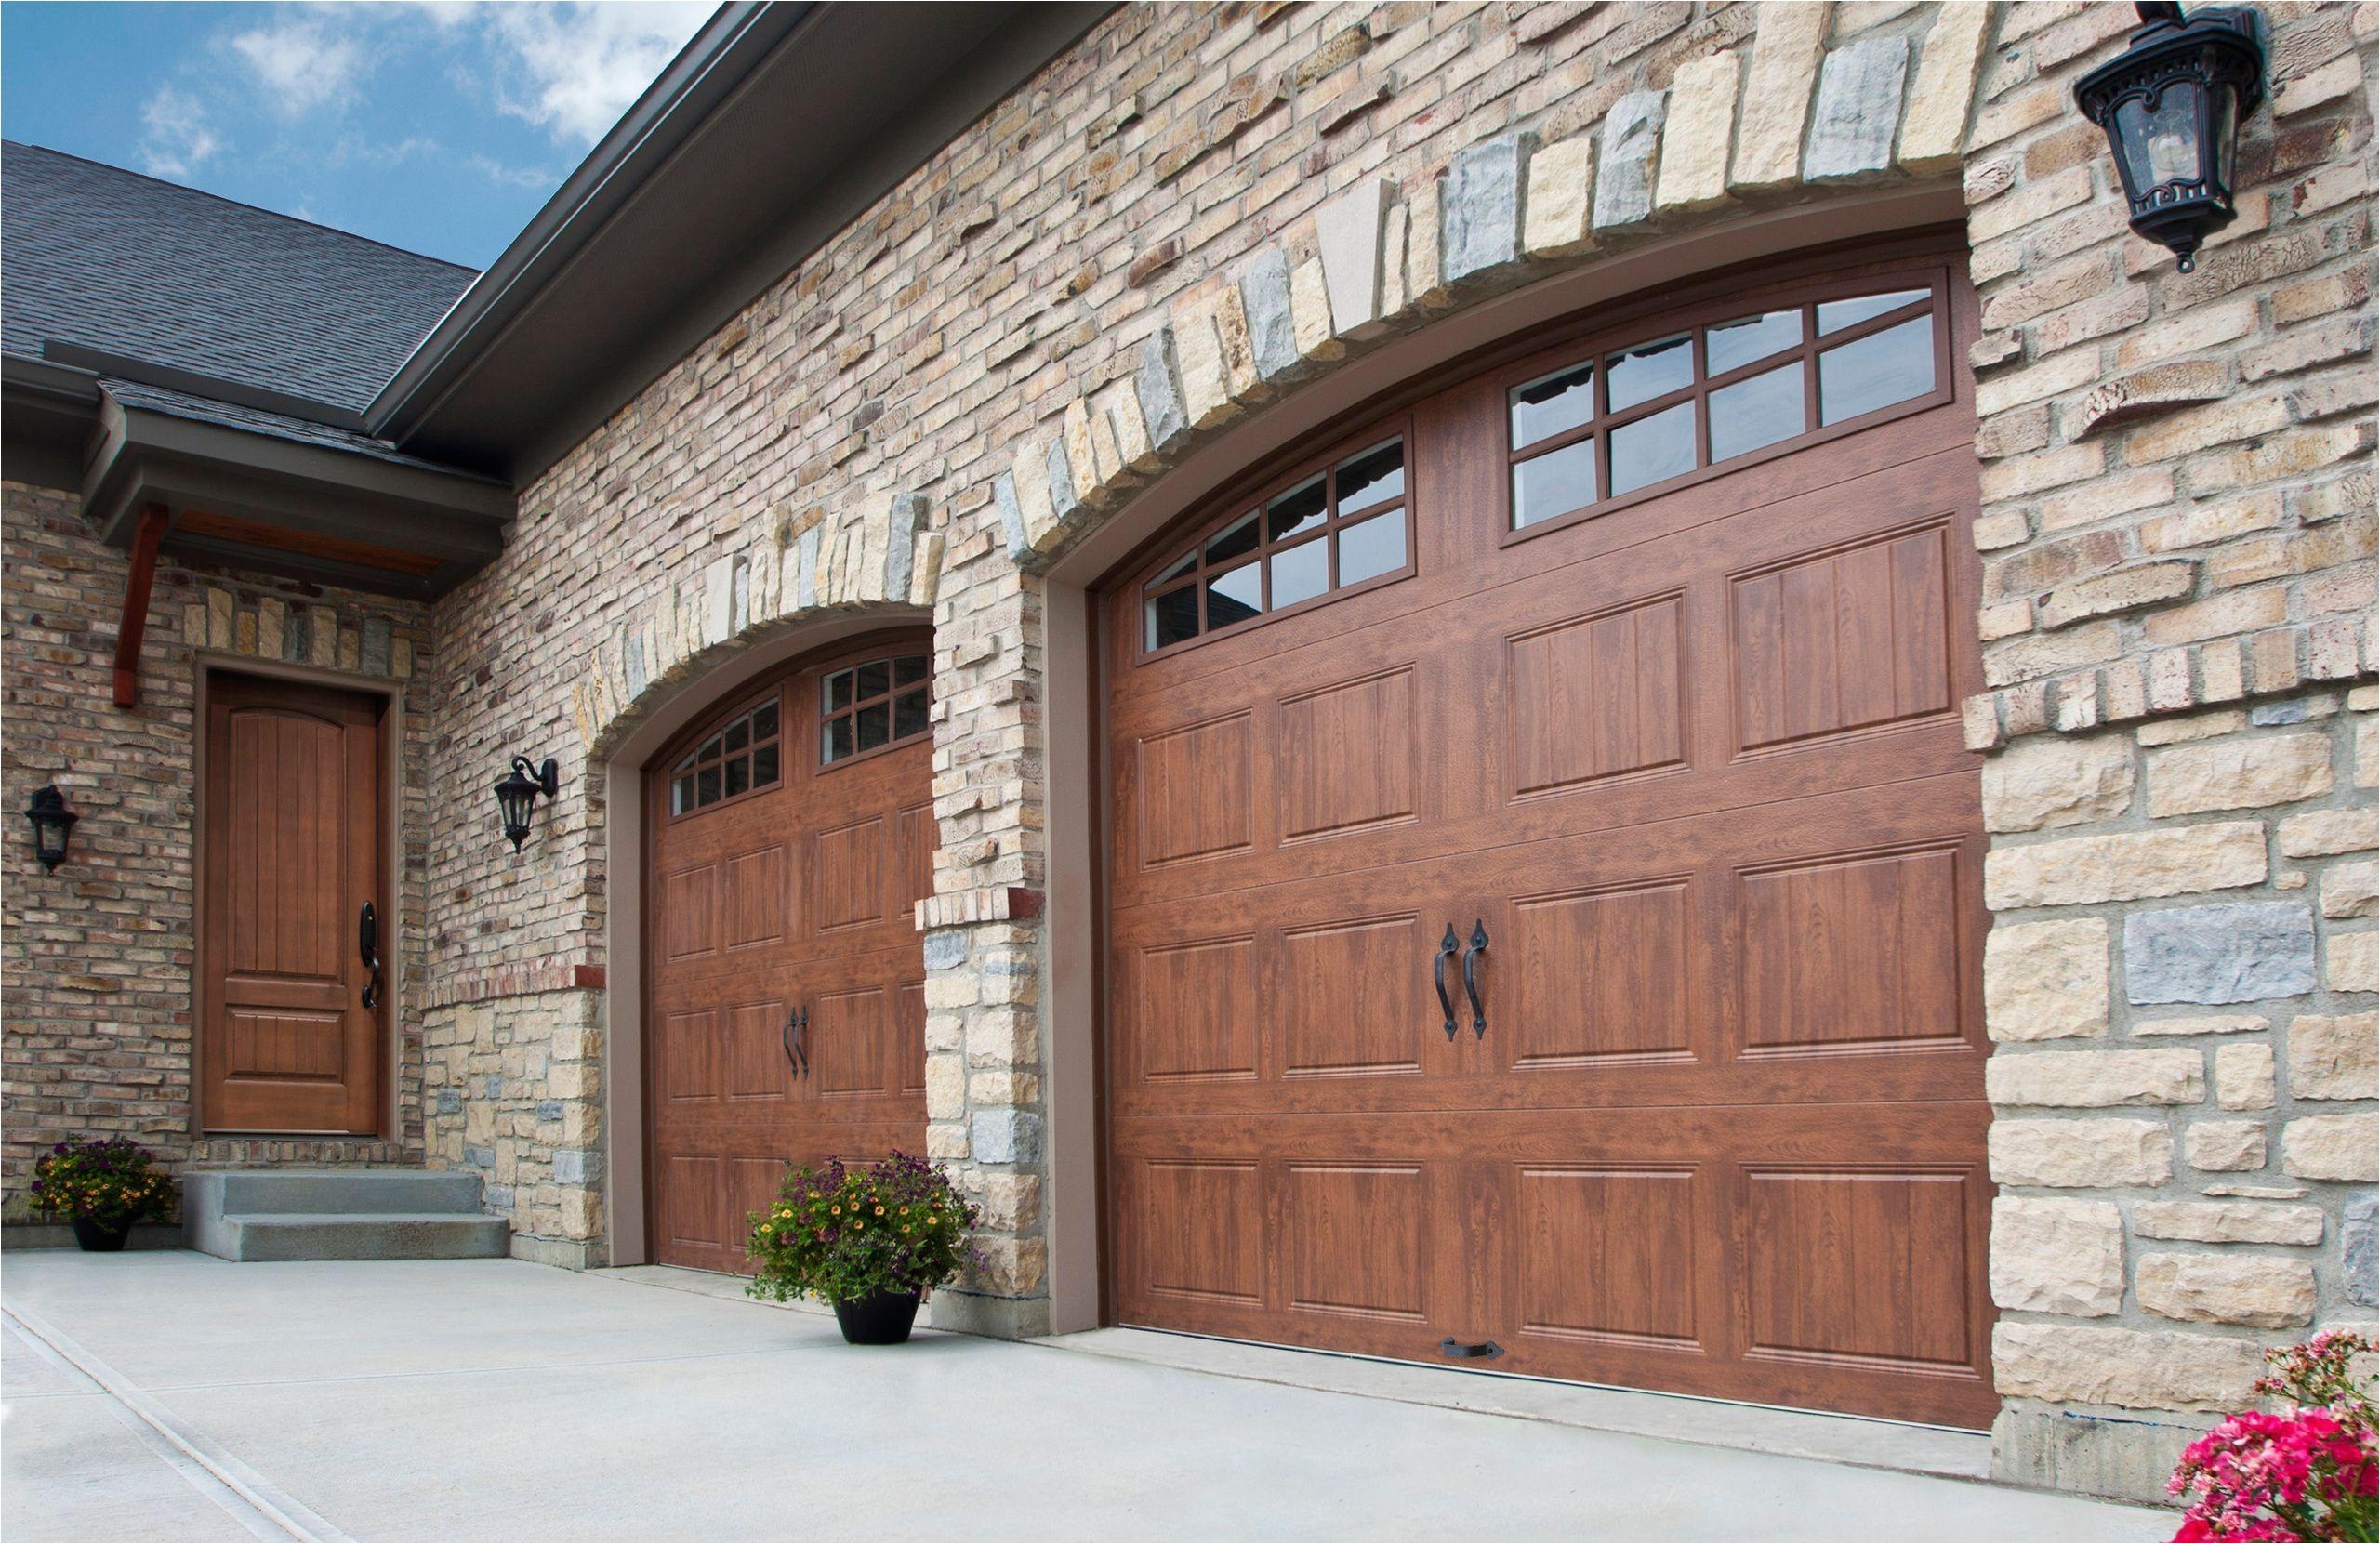 2018 bergen county nj best garage door repair specials 2018 garage door repair garage door repair masters nj 24 7 same day repair